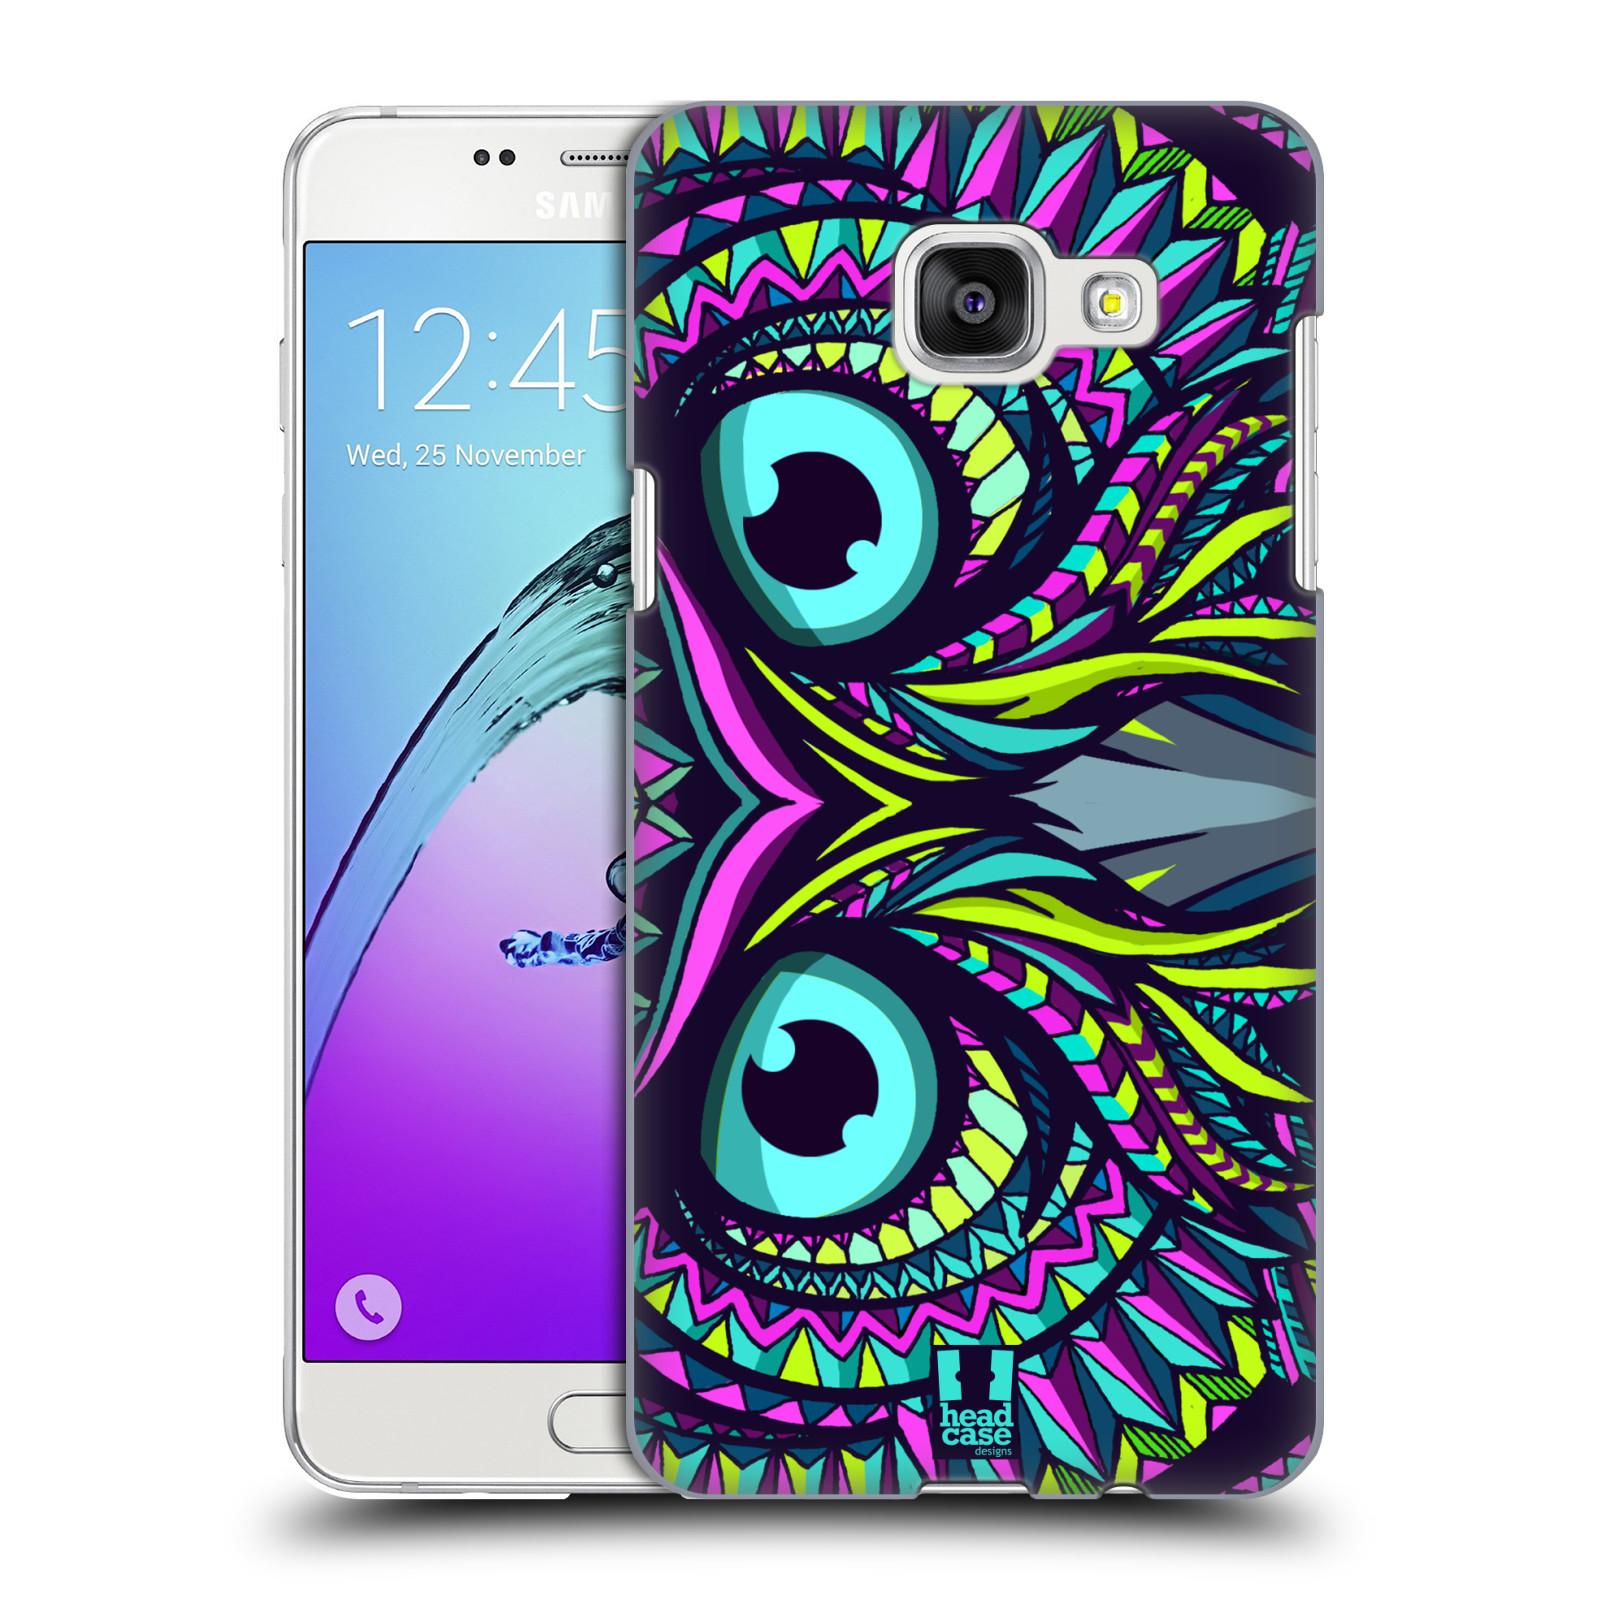 Plastové pouzdro na mobil Samsung Galaxy A5 (2016) HEAD CASE AZTEC SOVA